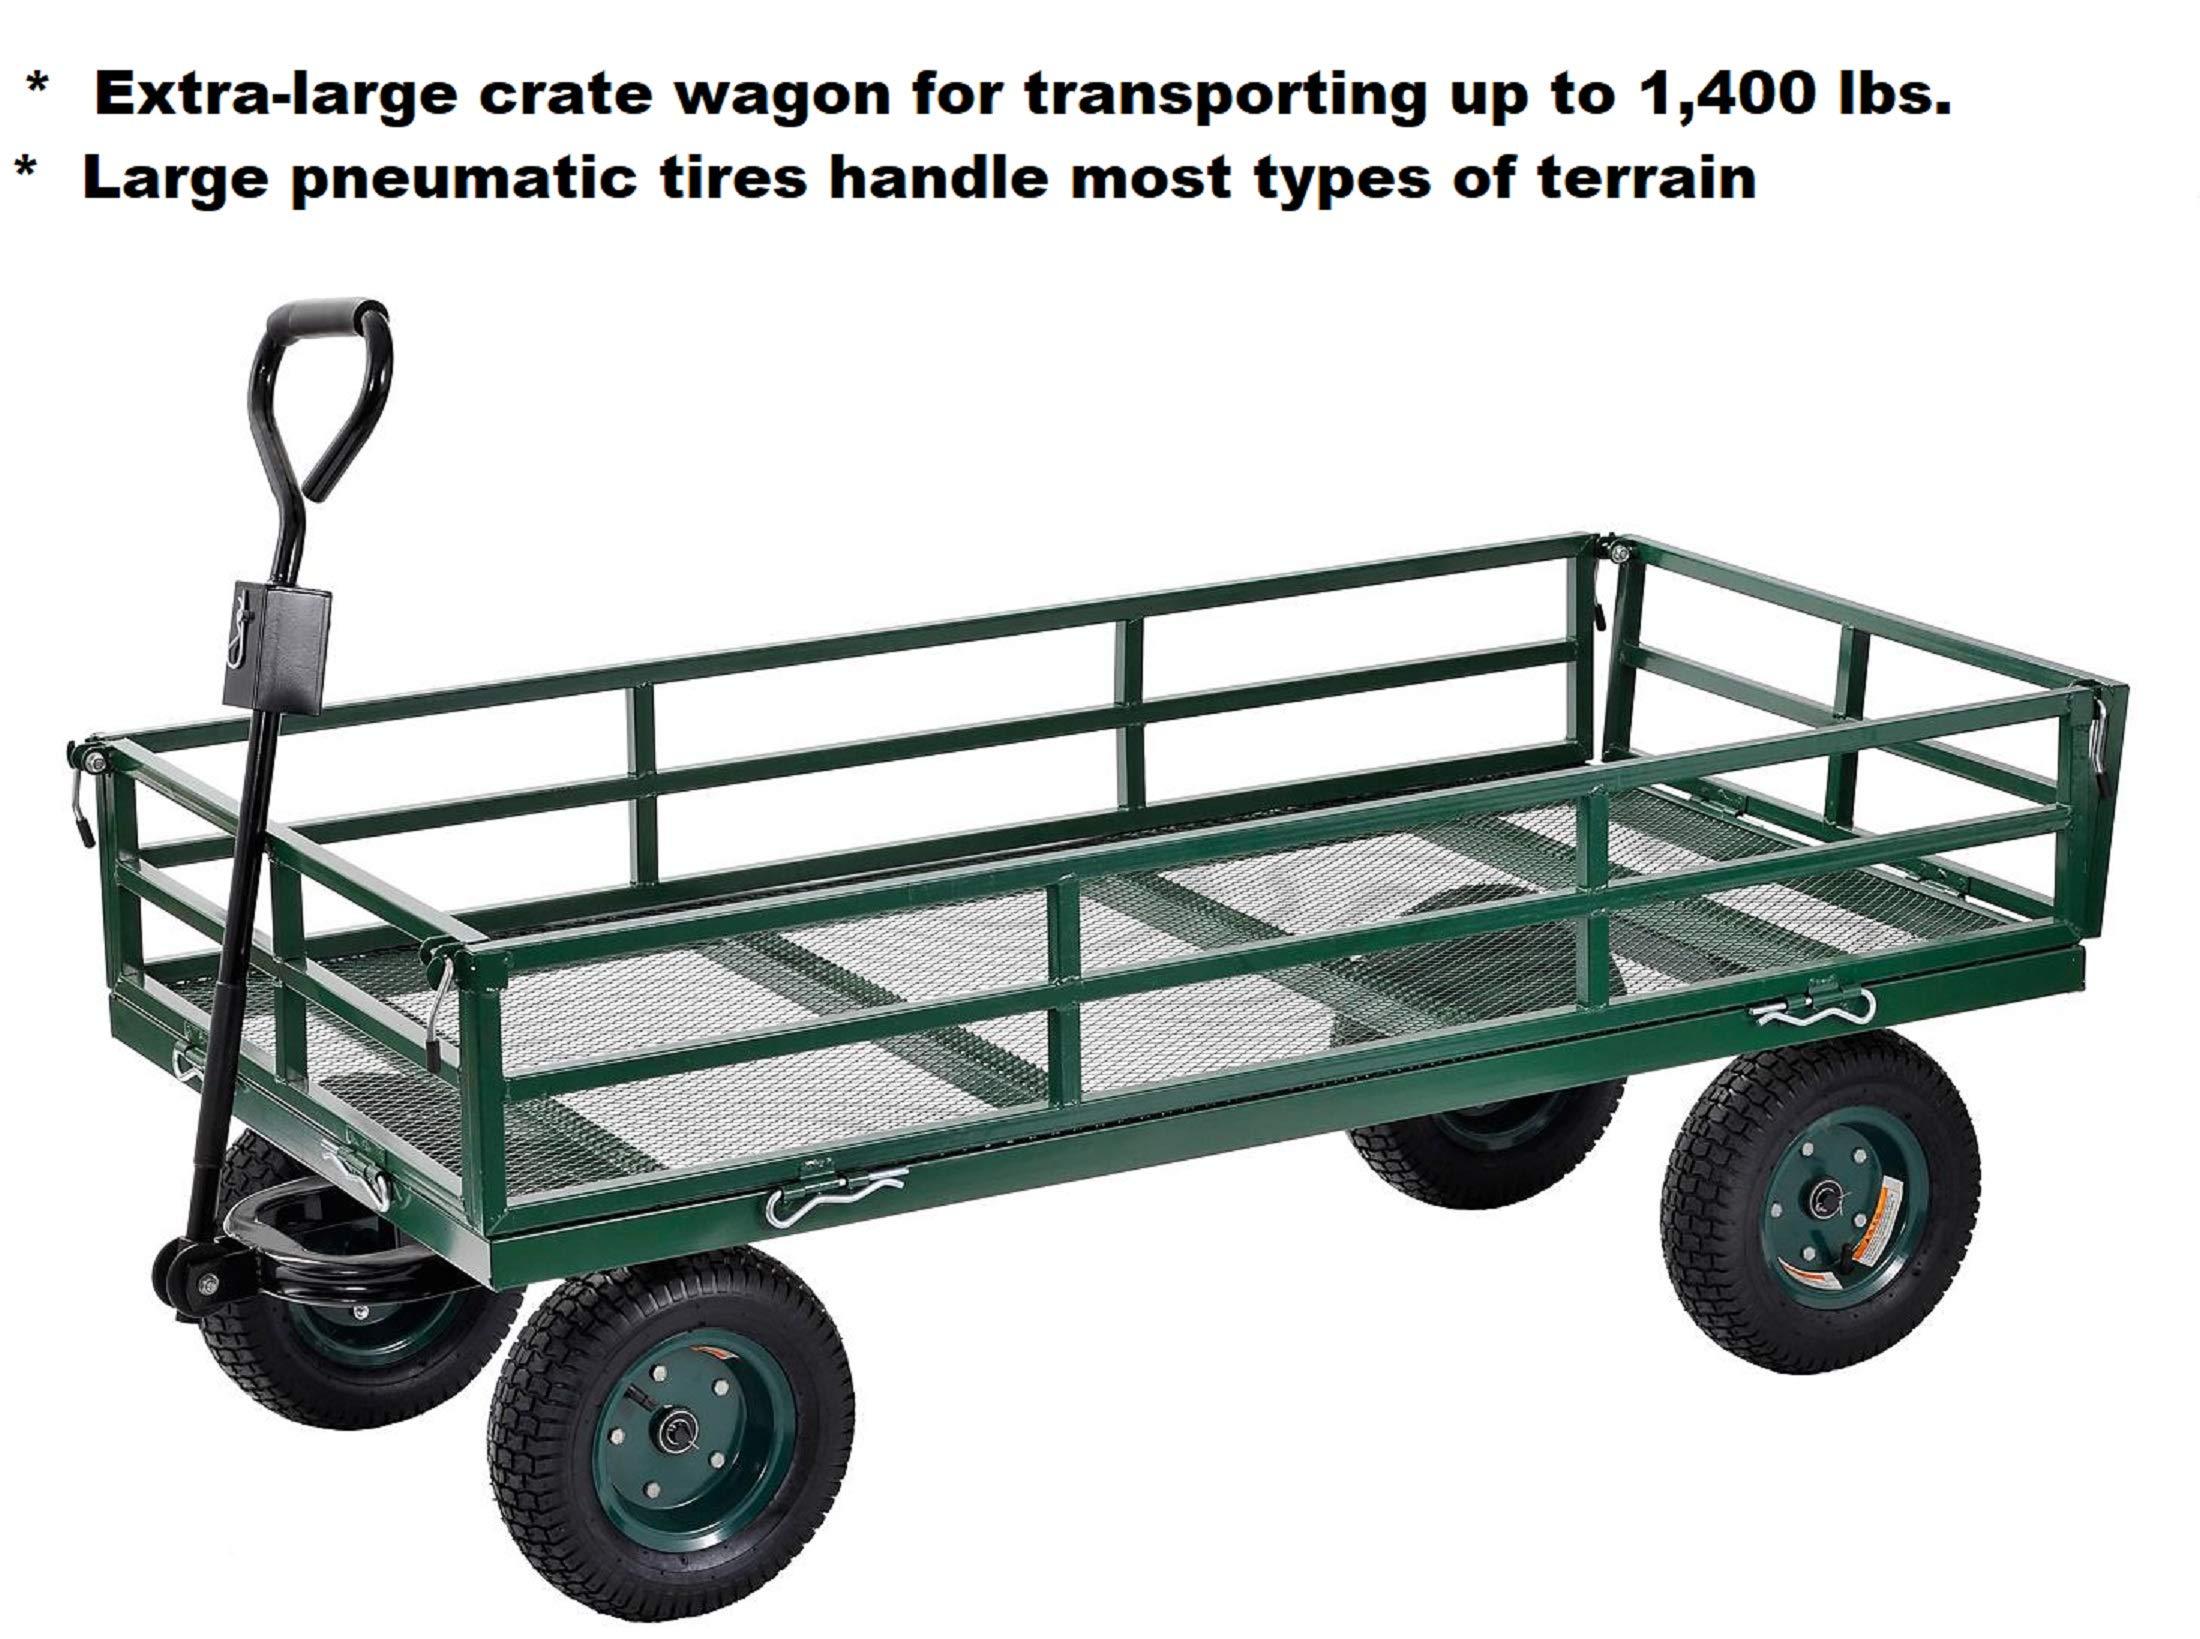 Heavy-Duty Wheelbarrow Utility Crate Wagon - 60'' x 31'' up to 1,400 lbs. Capacity by Generic